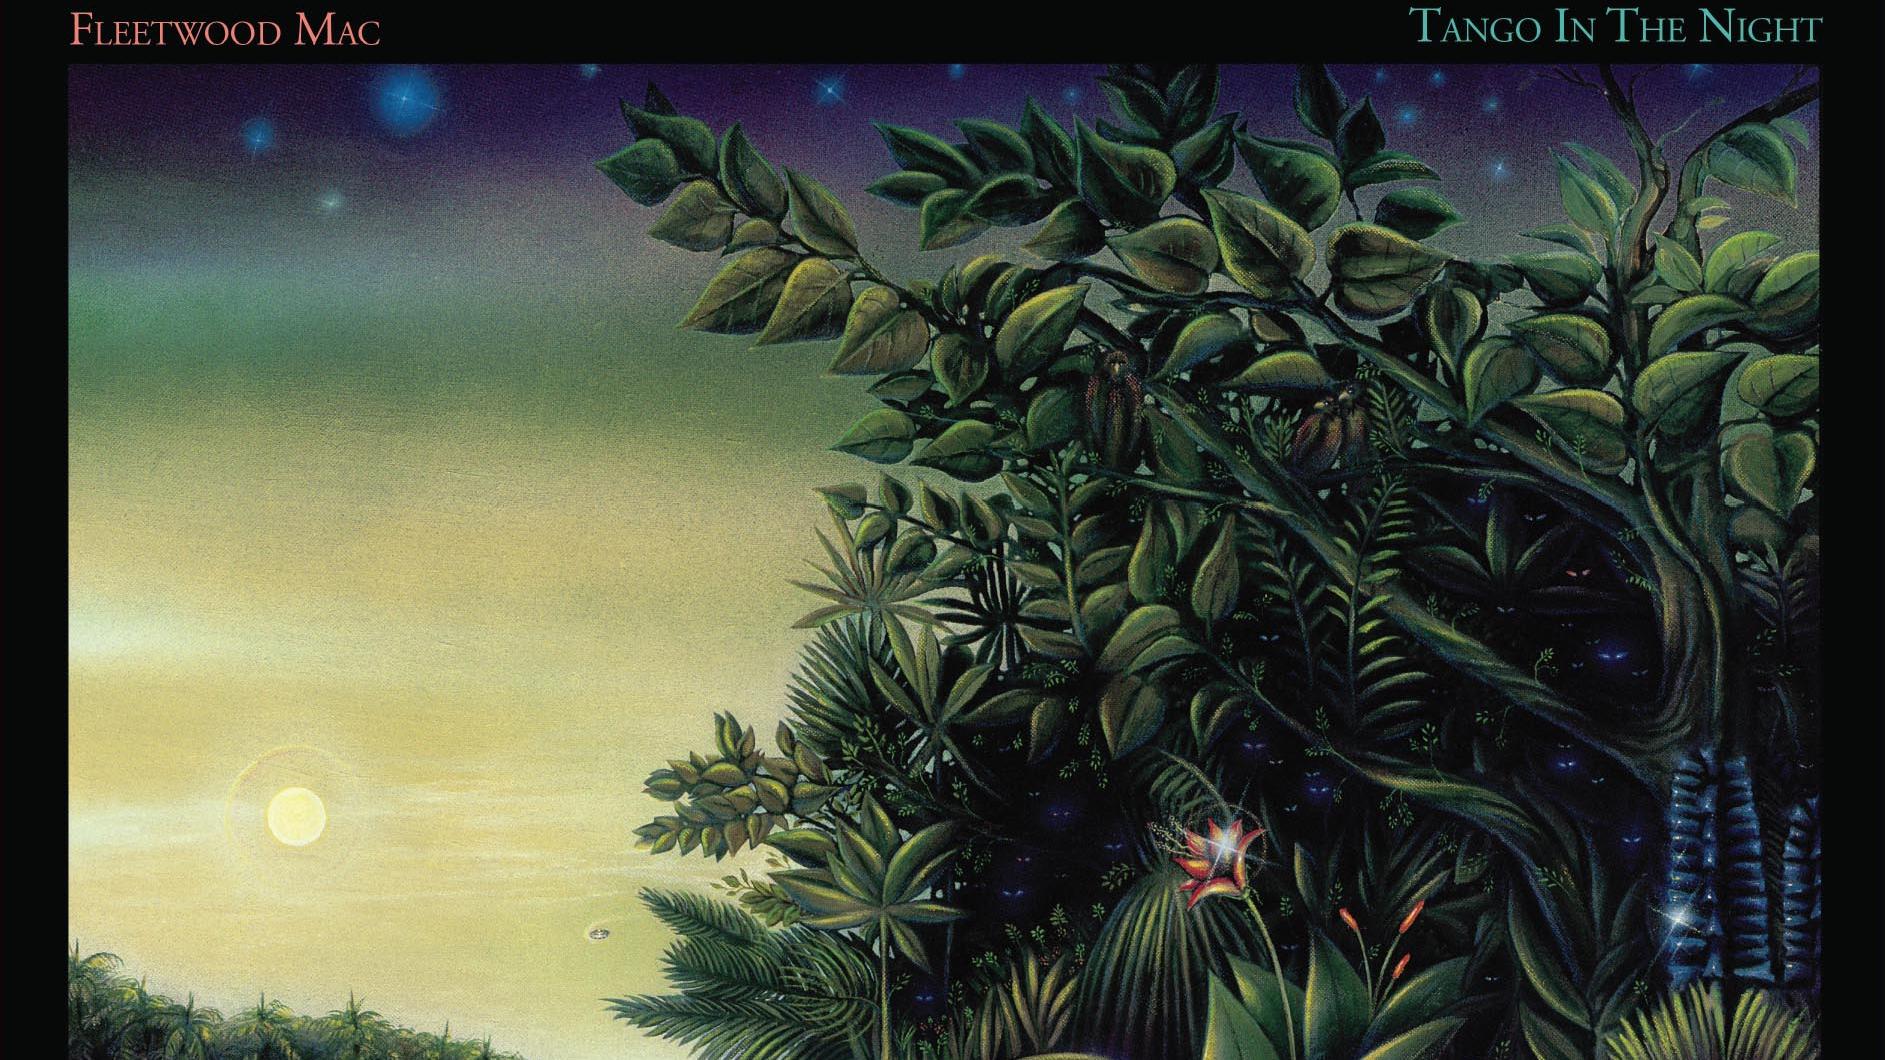 Fleetwood Mac - Tango In The Night Deluxe Edition album review ...